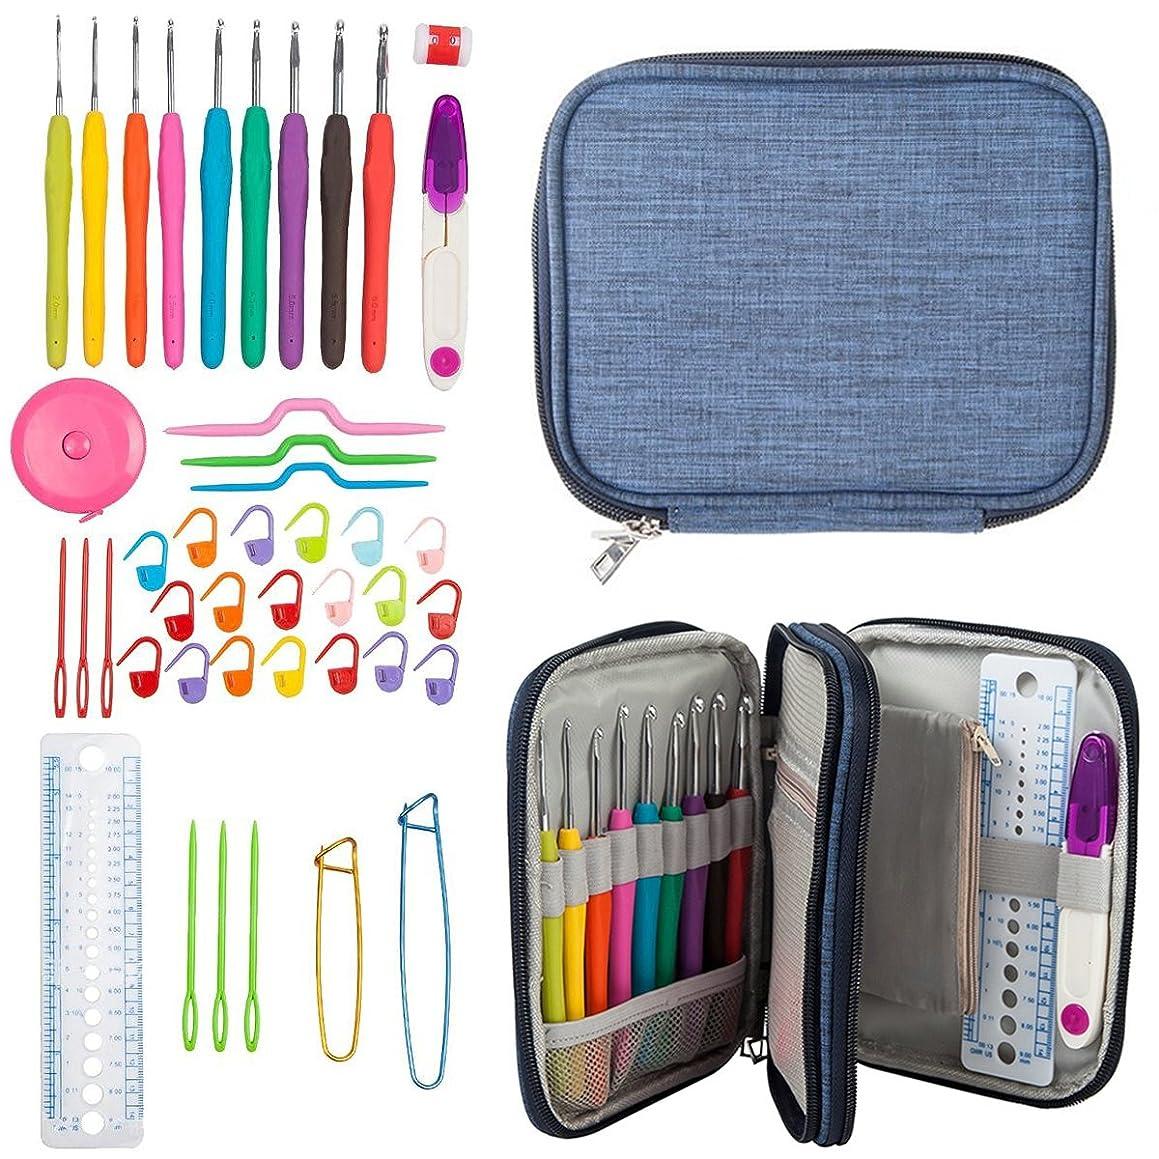 45 Pcs Crochet Hooks Stitches Knitting Needle Kit PERTTY Sewing Tools For DIY Knitting Needle Kit with Zipper Case Organizer